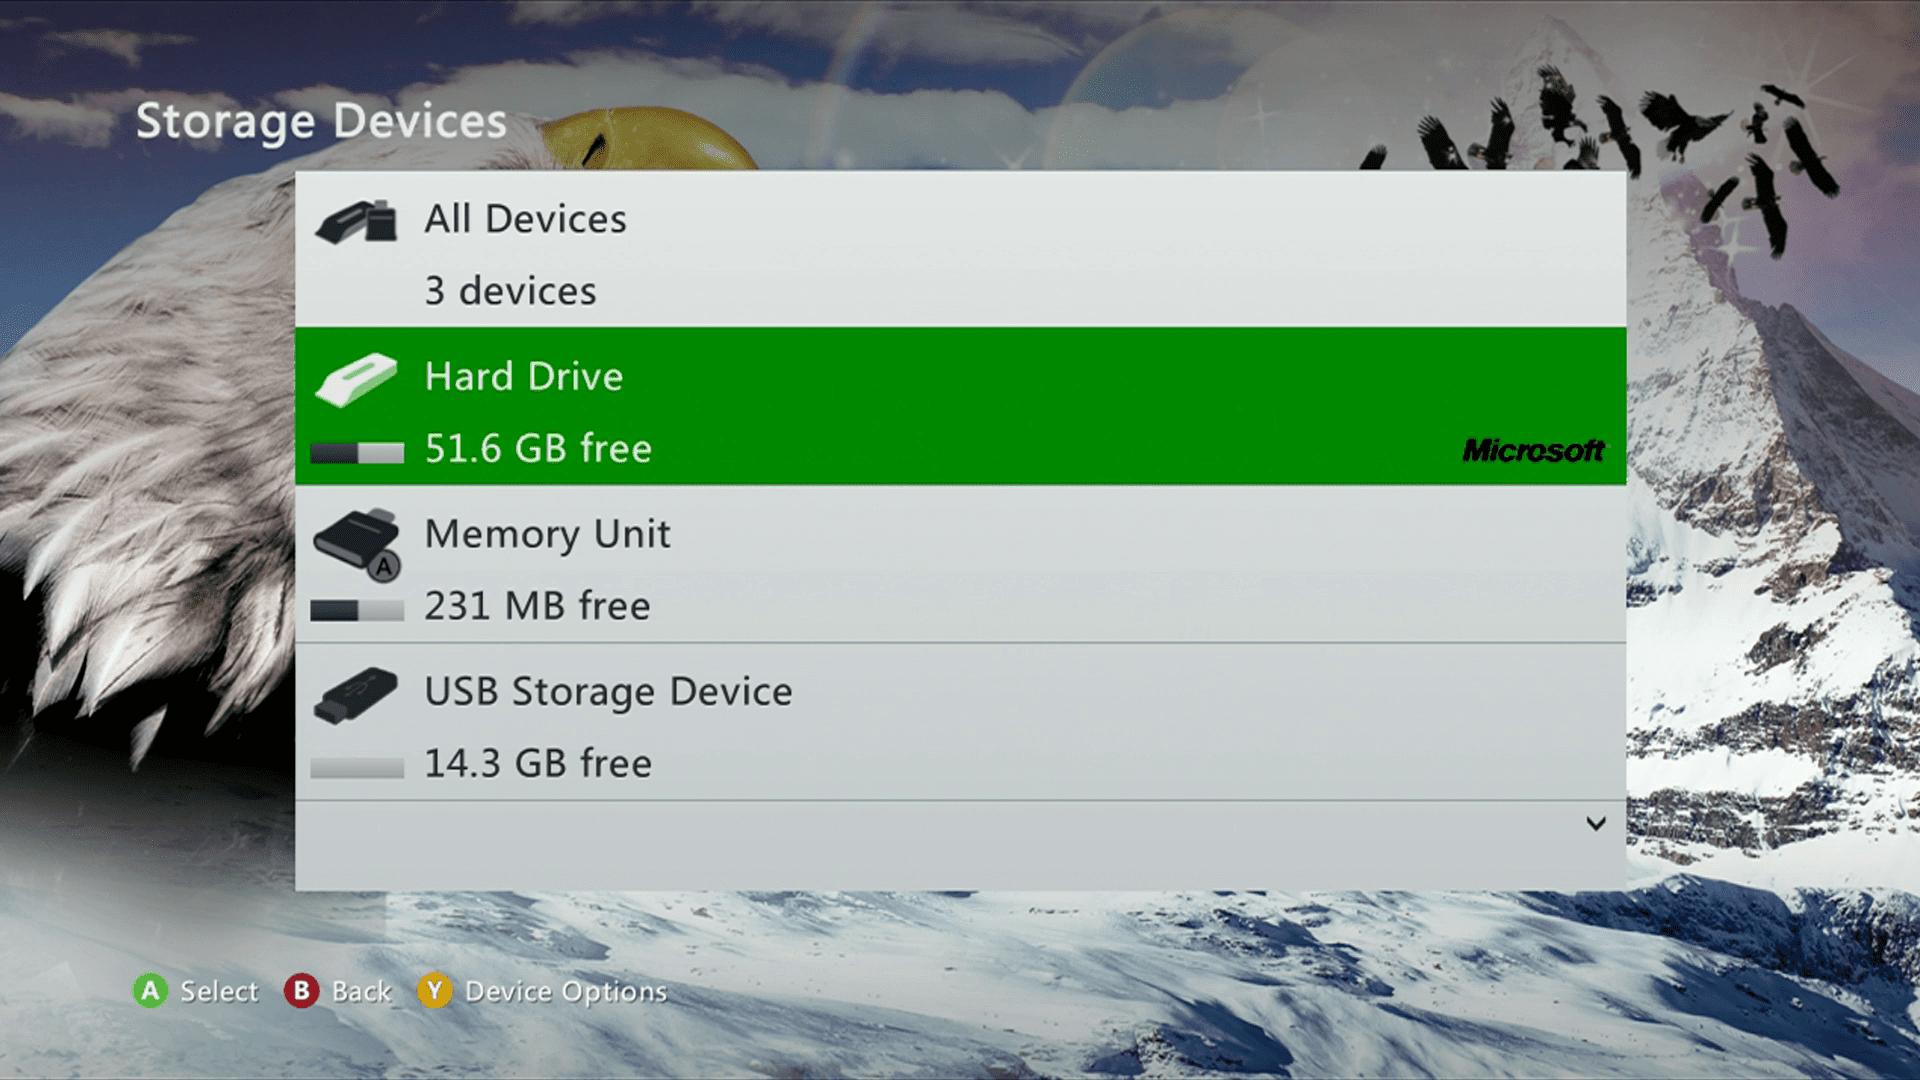 Storage Devices screenshot